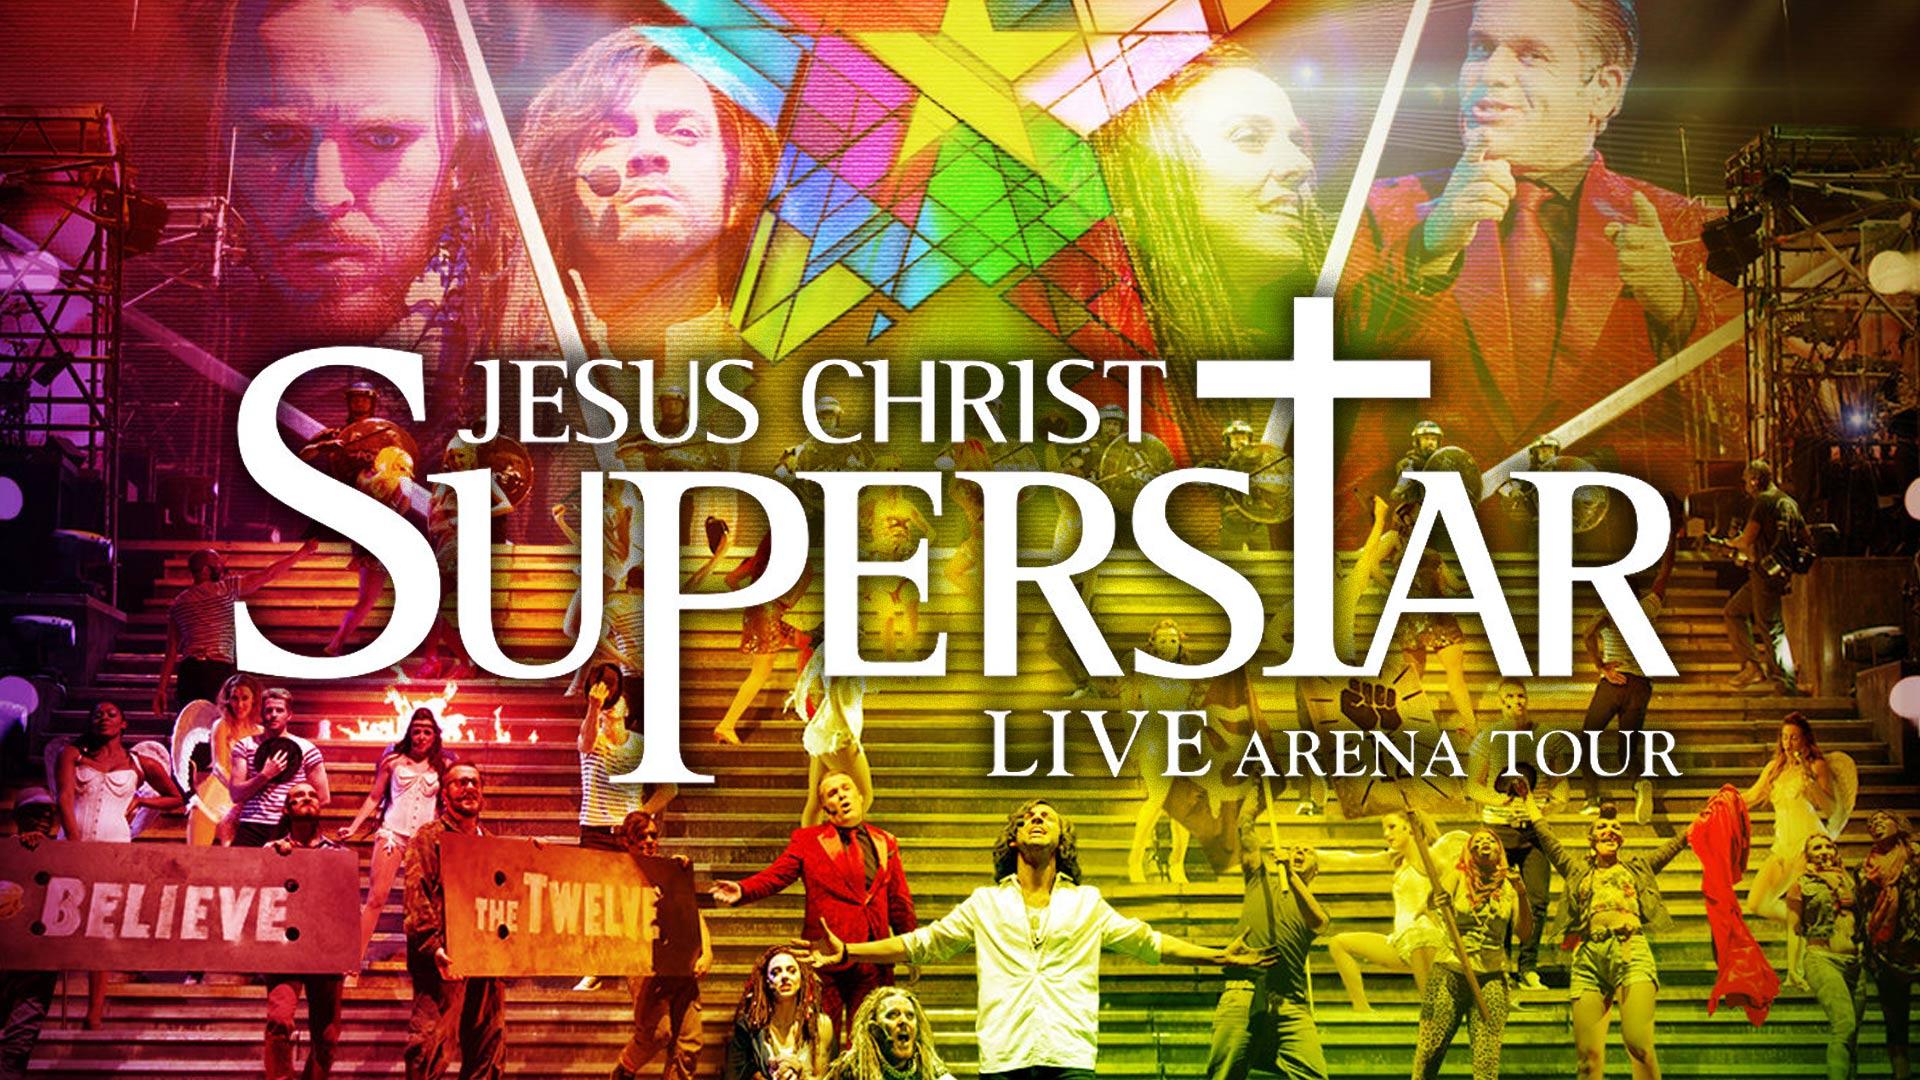 Jesus Christ Superstar Live Arena Tour